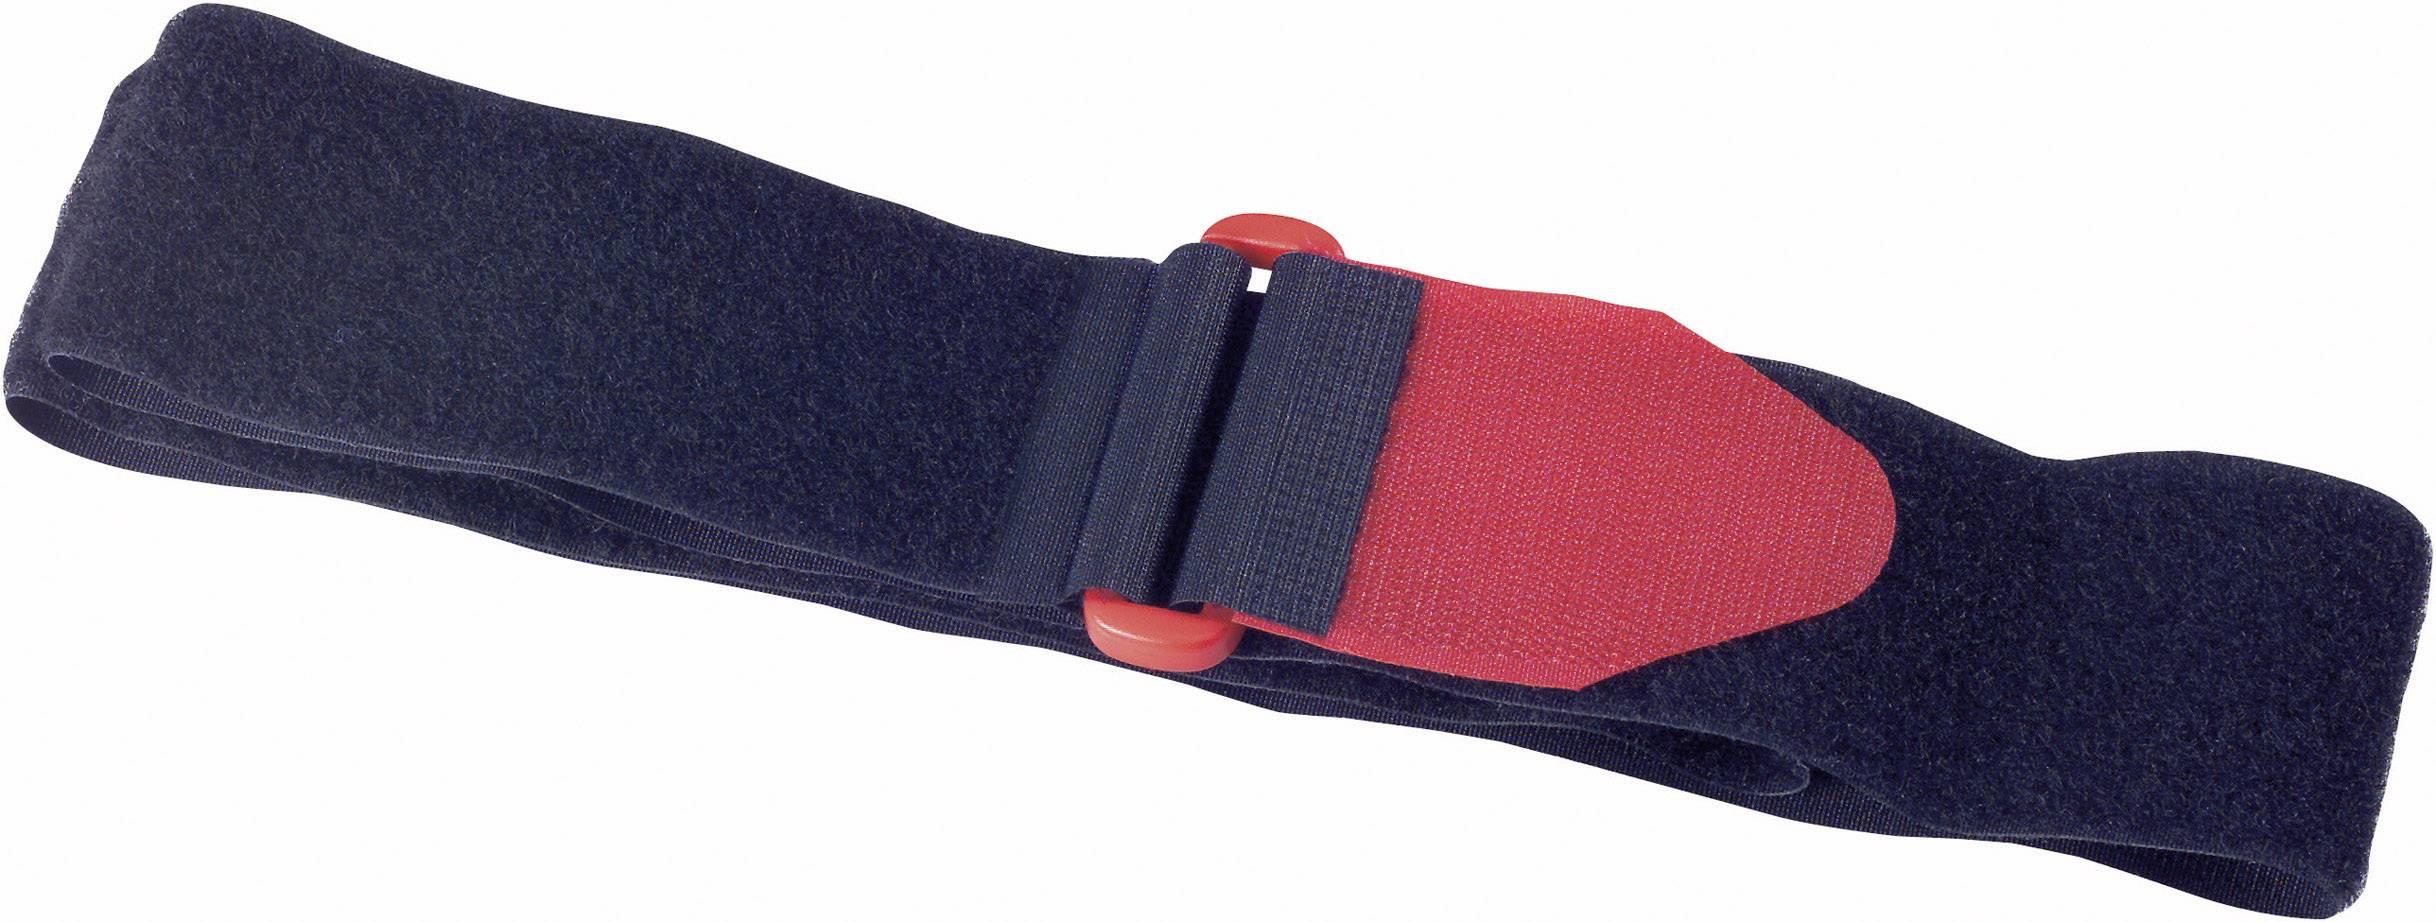 Pásik so suchým zipsom Fastech 690-330, (d x š) 600 mm x 38 mm, čierna, červená, 2 ks